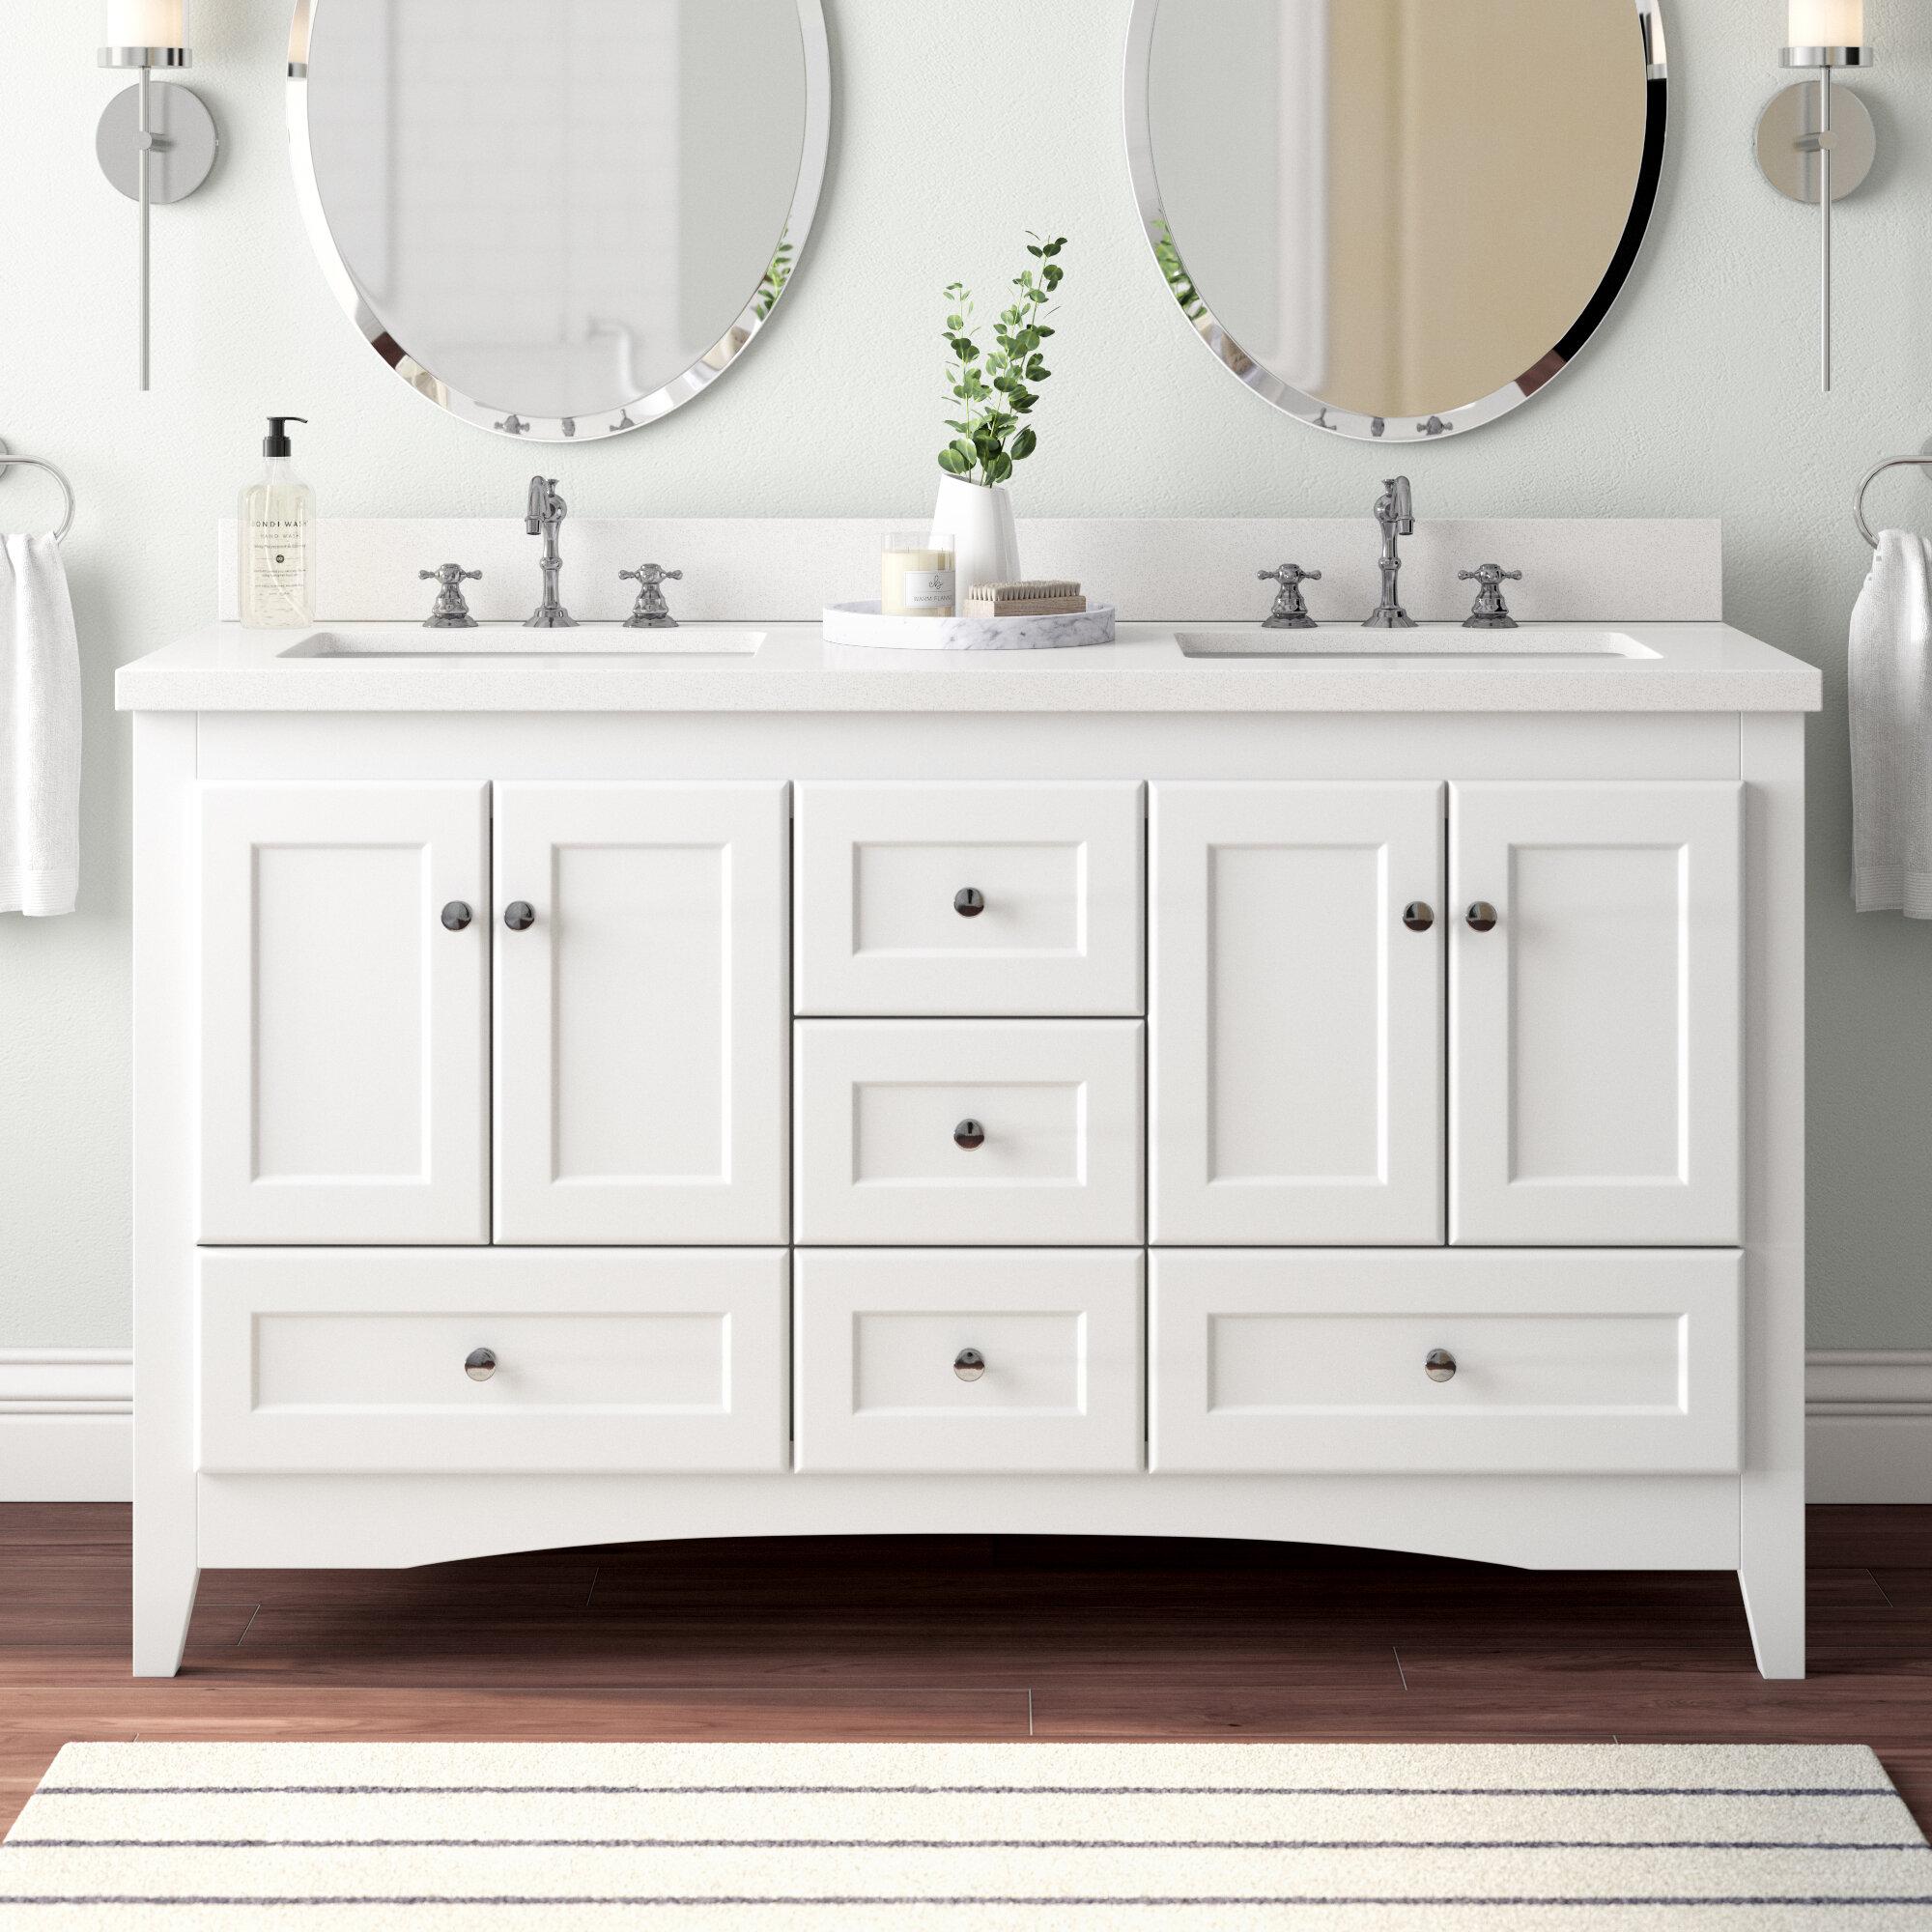 Birch Lane Prentice 60 Double Bathroom Vanity Set Reviews Wayfair